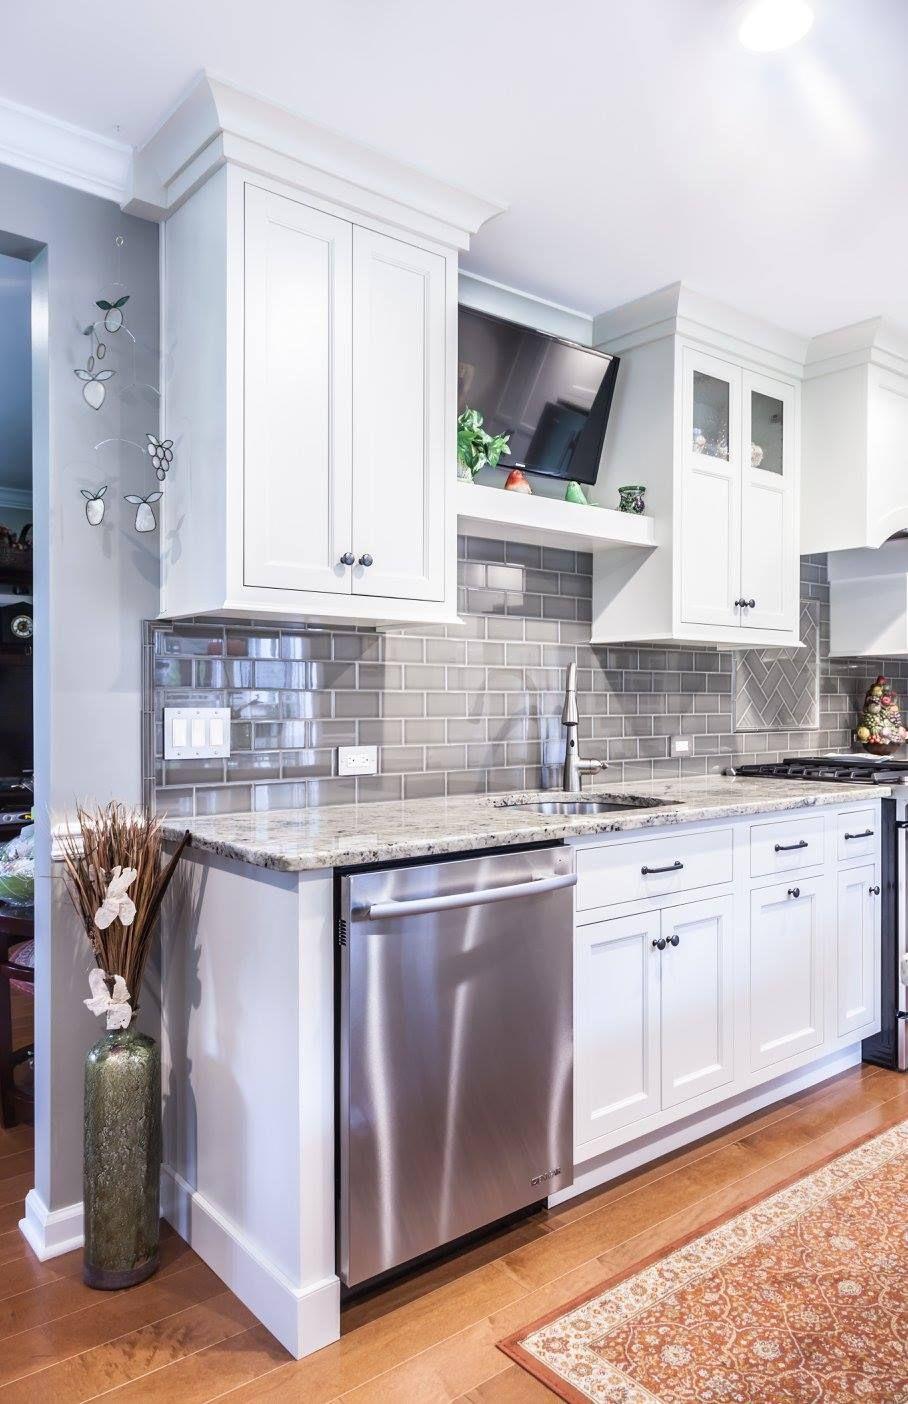 Enchanted kitchen chatham NJ.   ◢ Kitchen Renovation Ideas ...